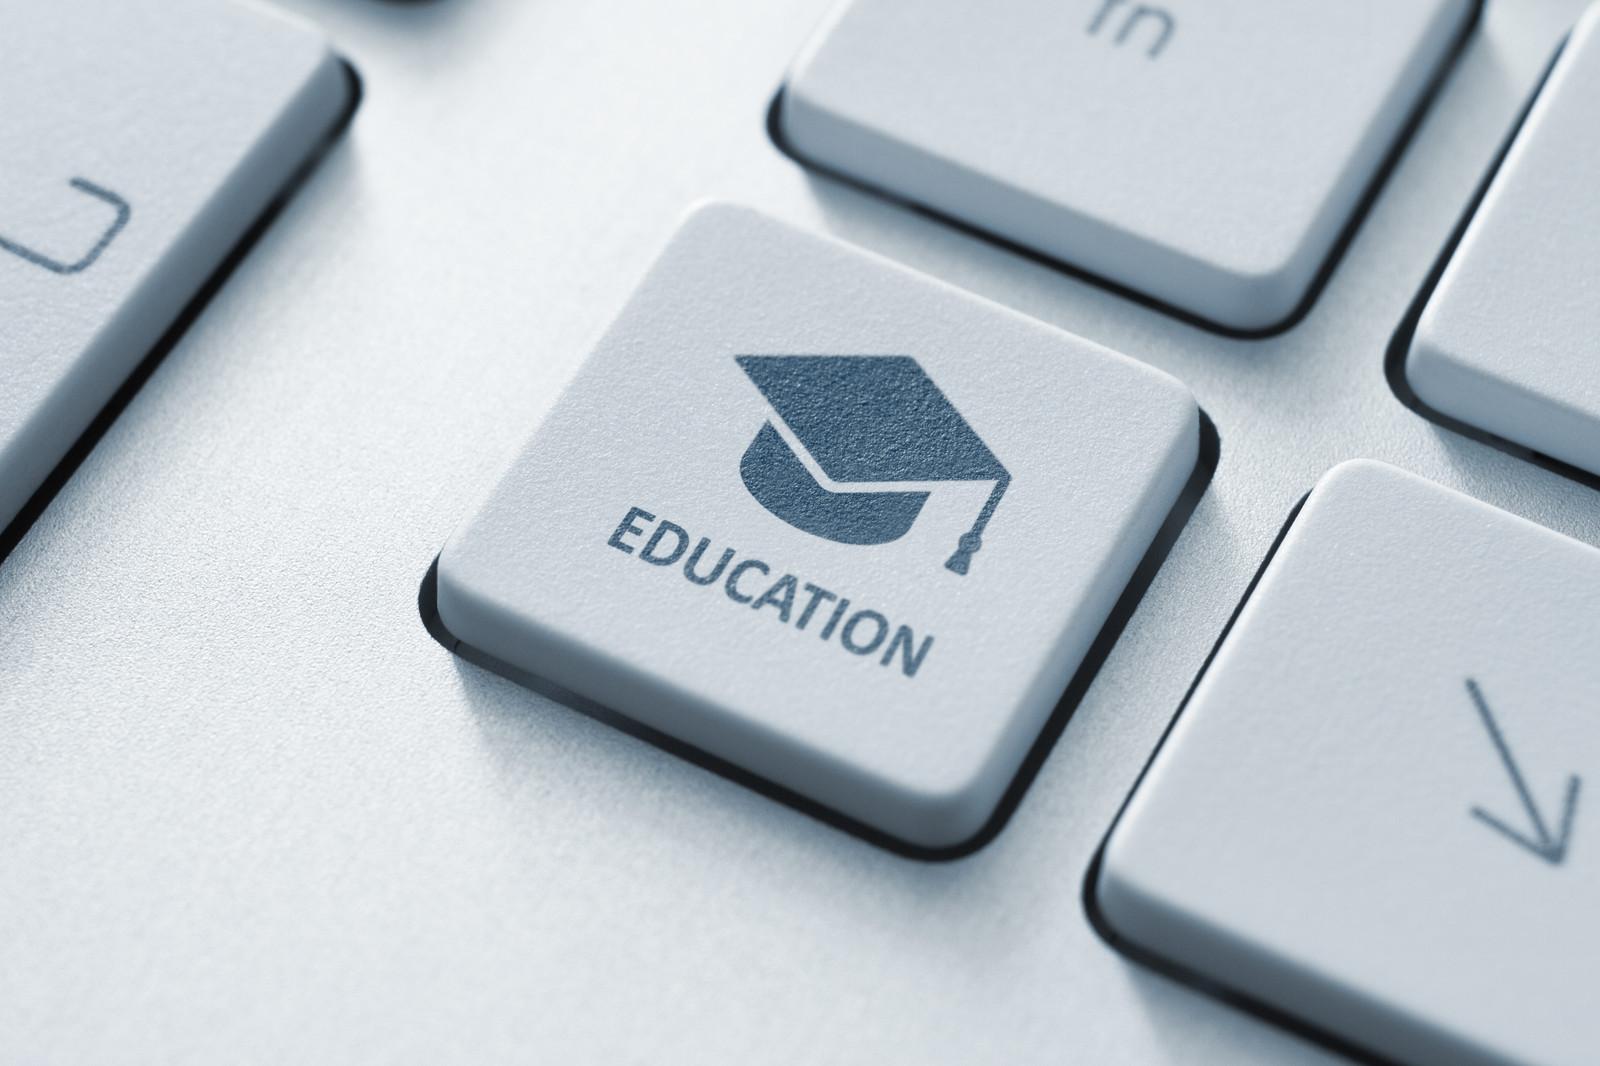 Protected: Pengantar Teknologi Pendidikan 2018 B